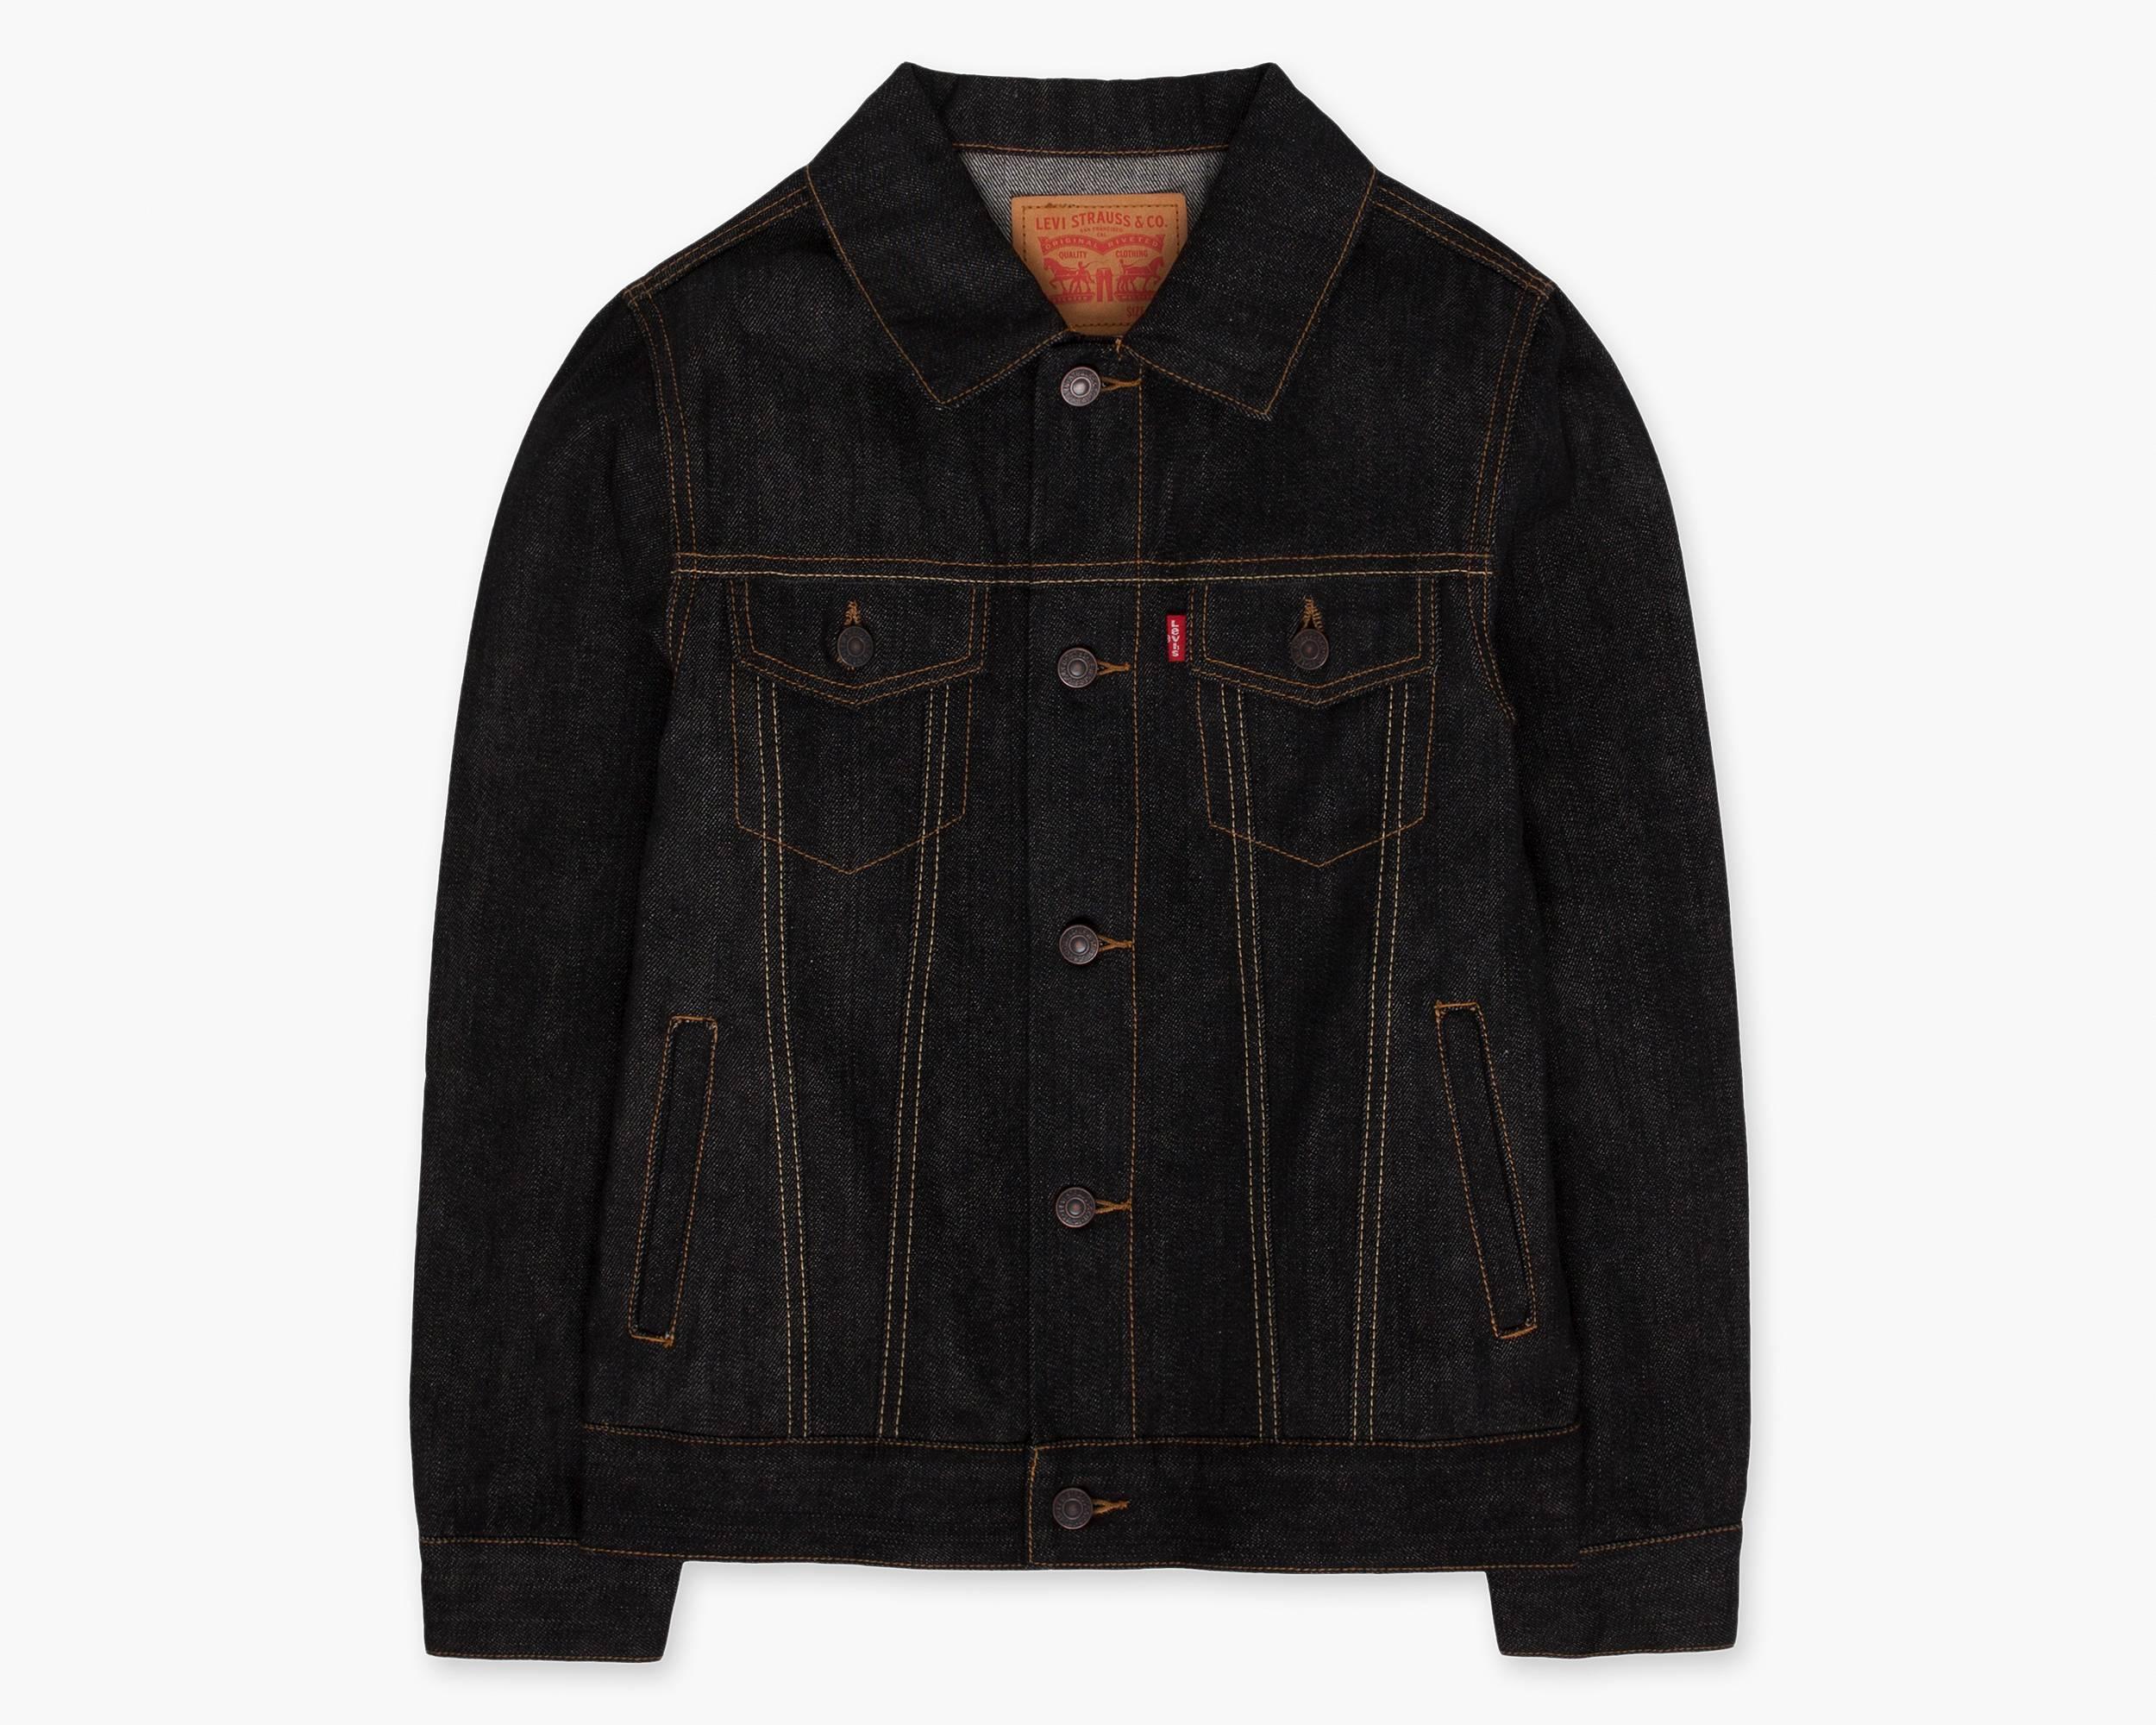 Boys Jean Jackets & Denim Vests - Boys Outerwear | Levi's®